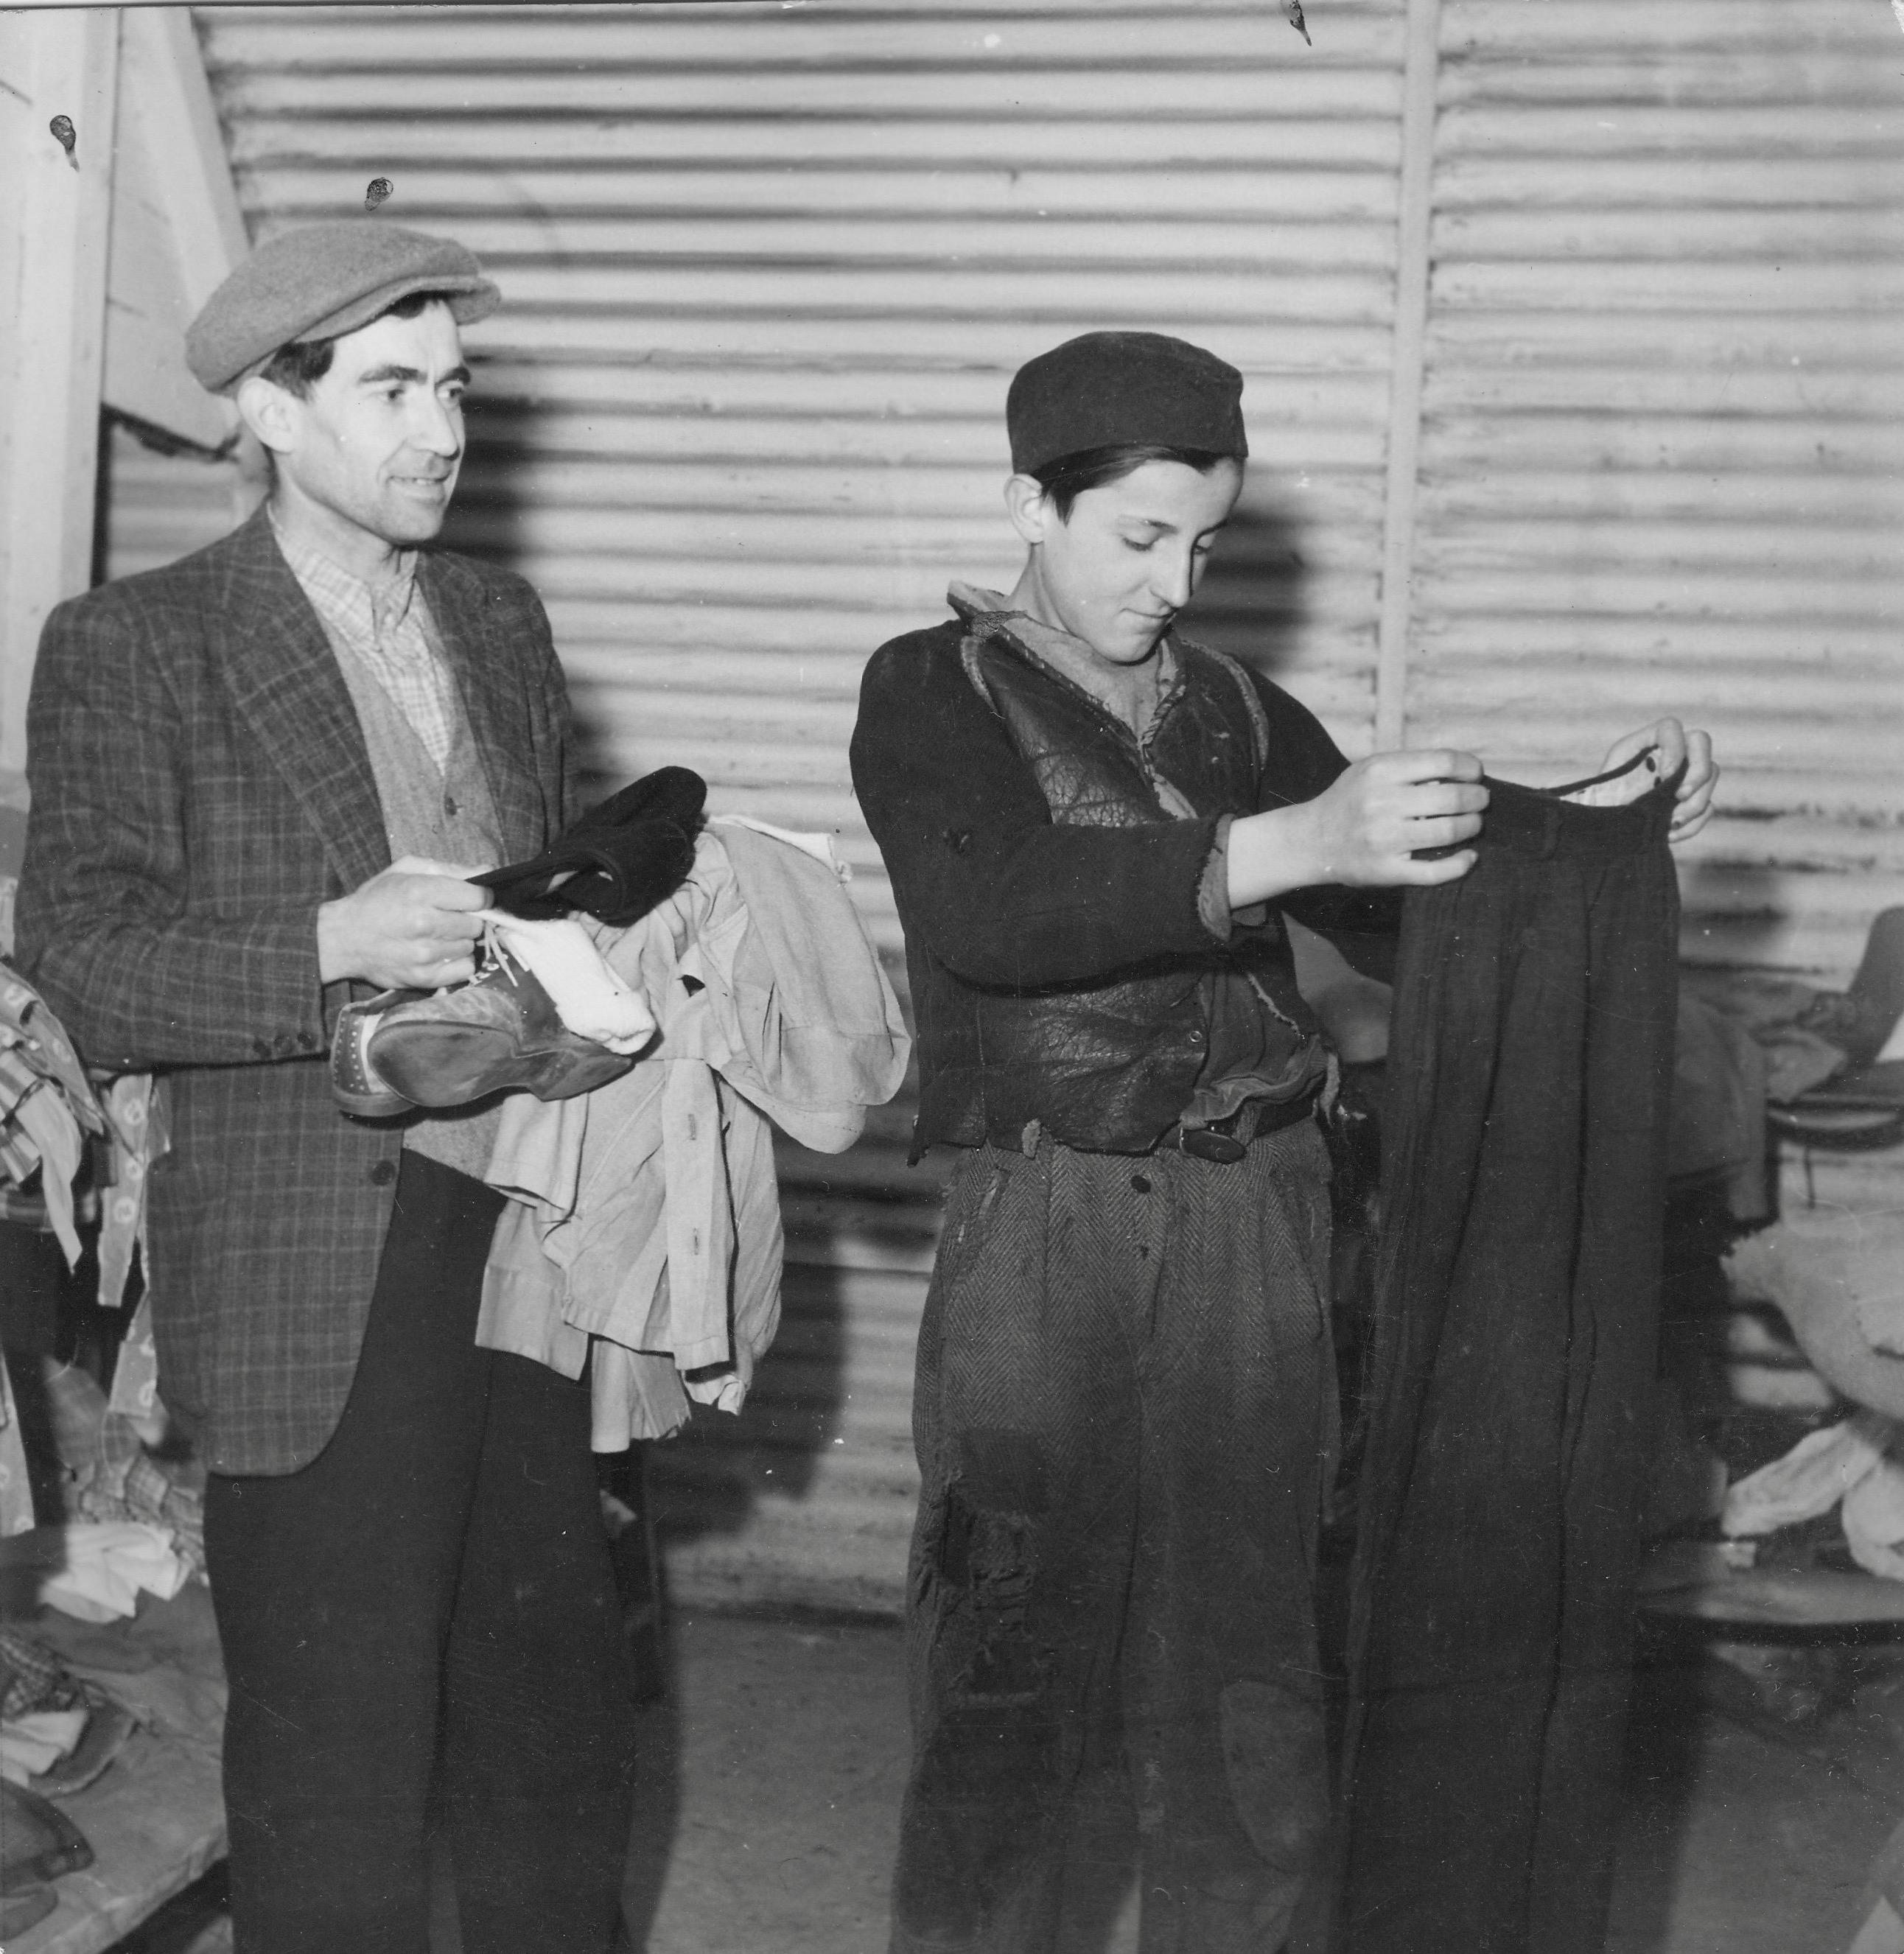 San Sabba, Hungarian boy (16 yrs) just across the border receives a pair of pants 1950-51